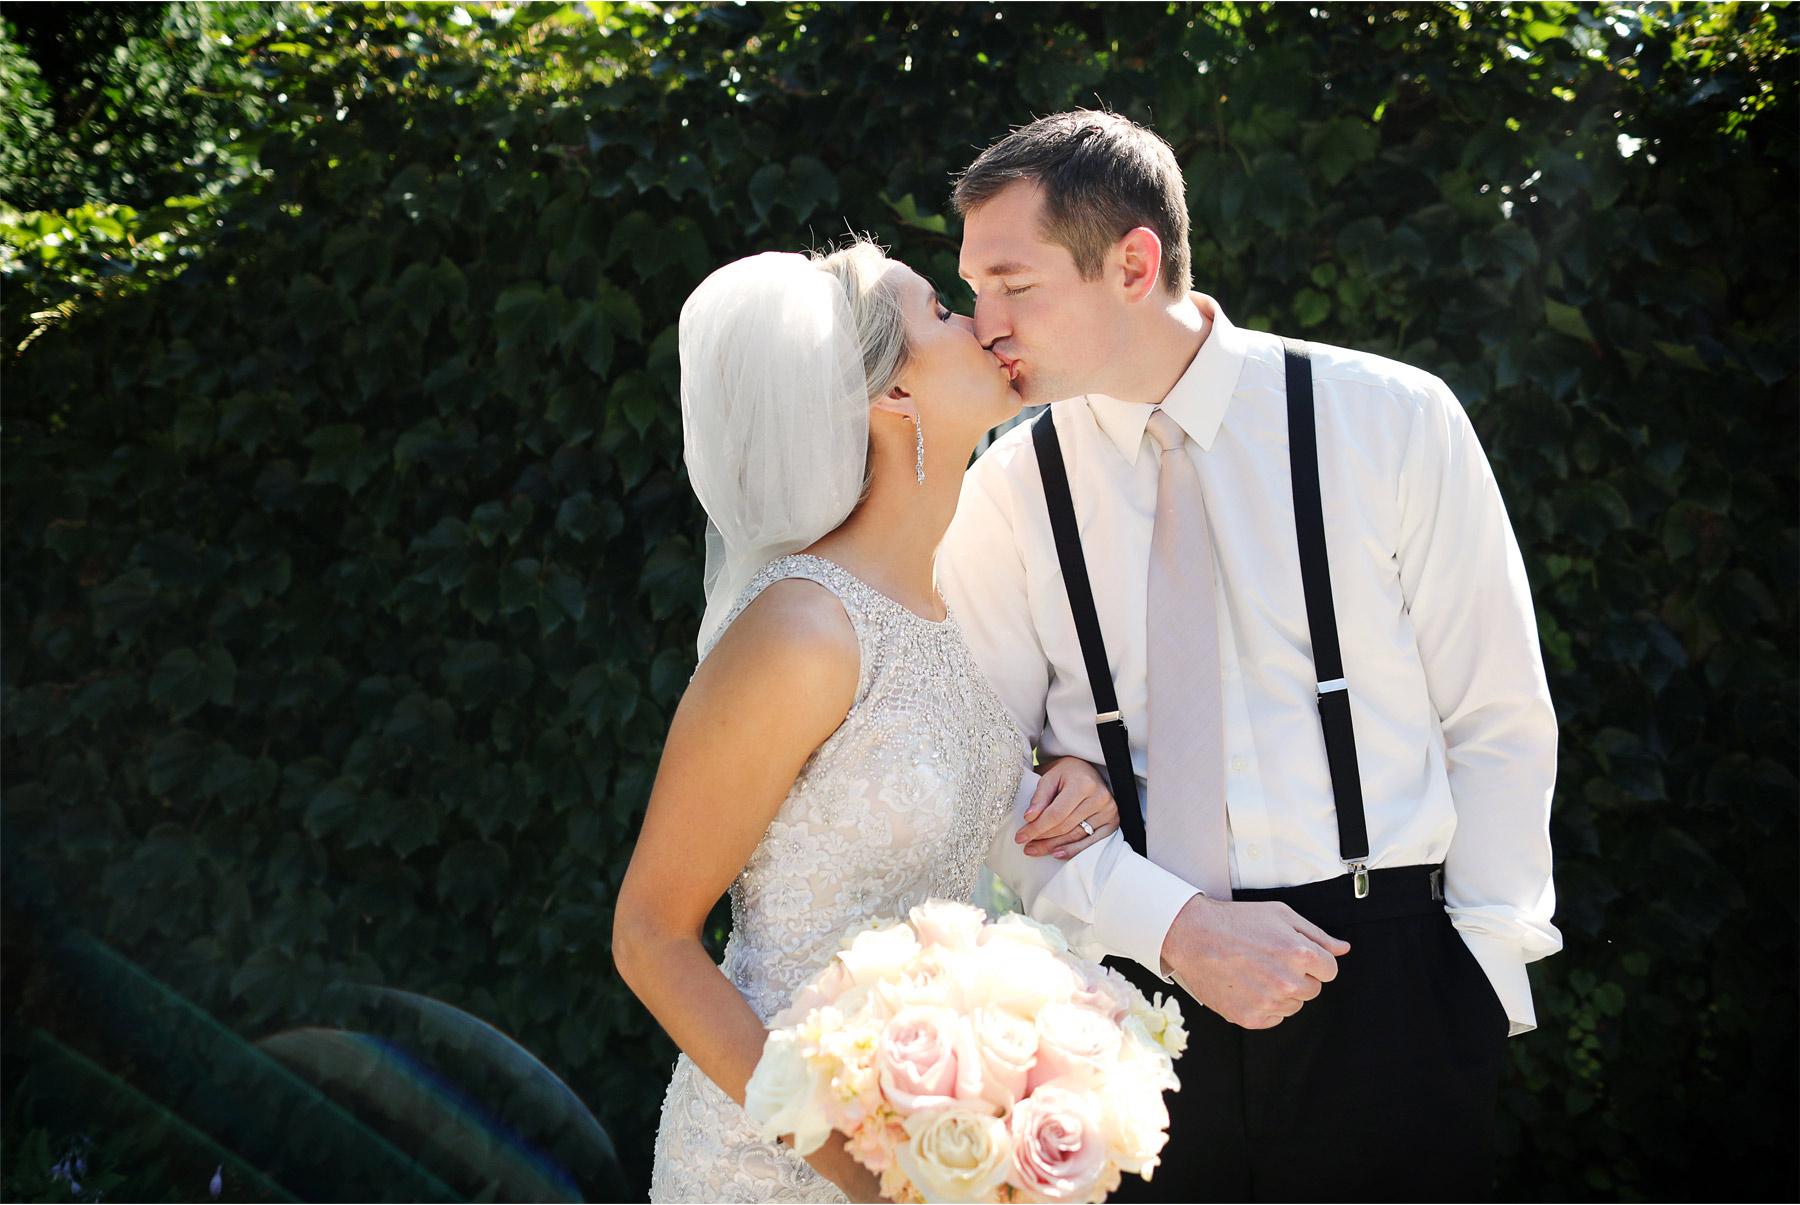 08-Minneapolis-Minnesota-Wedding-Photography-by-Vick-Photography-Jenna-and-Josh.jpg